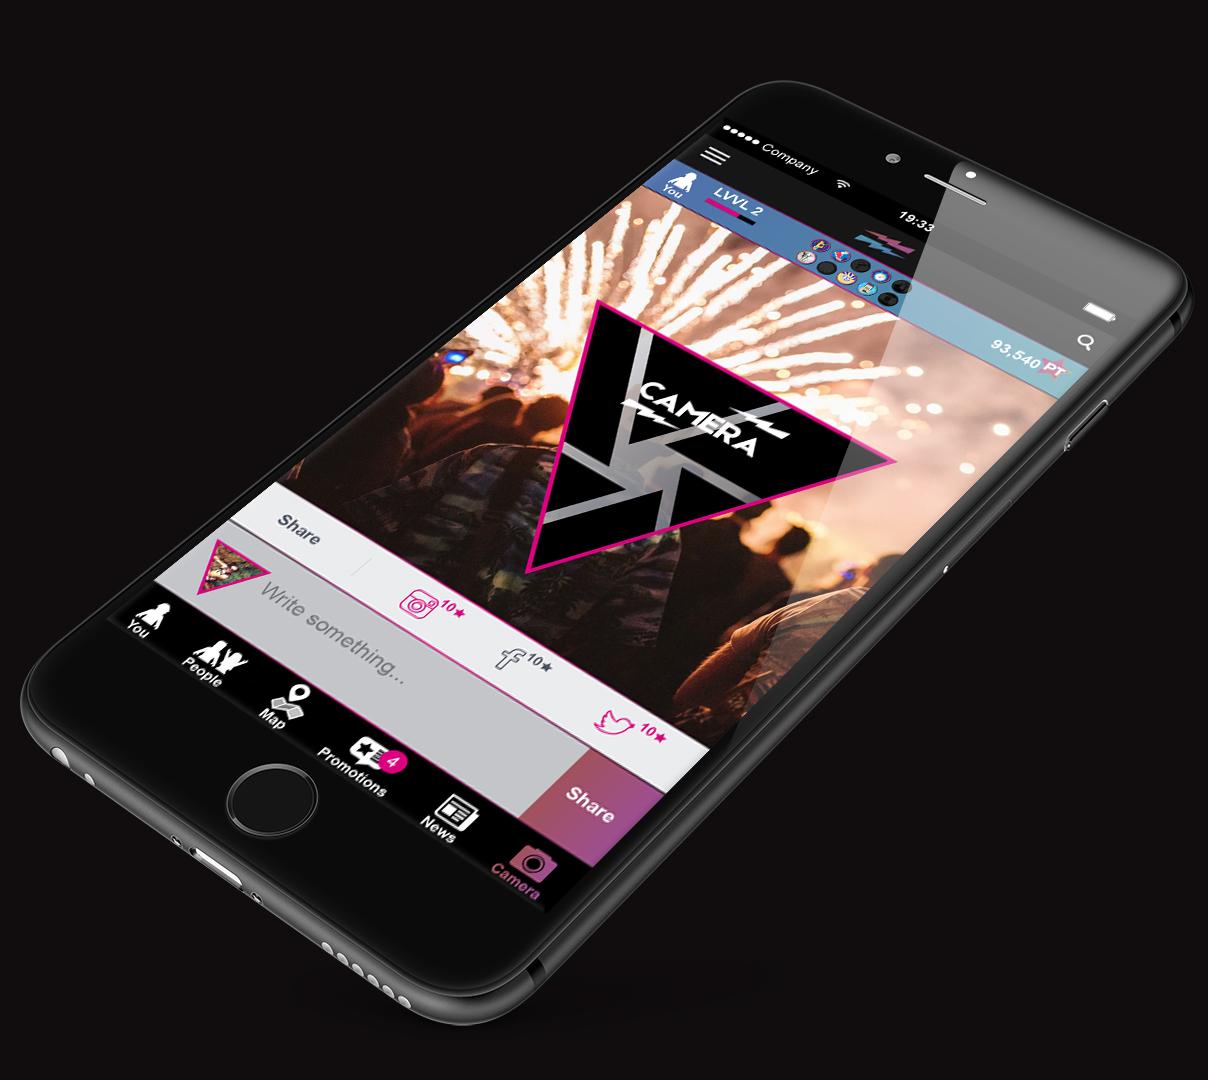 LEVVEL iPhone_app camera.jpg